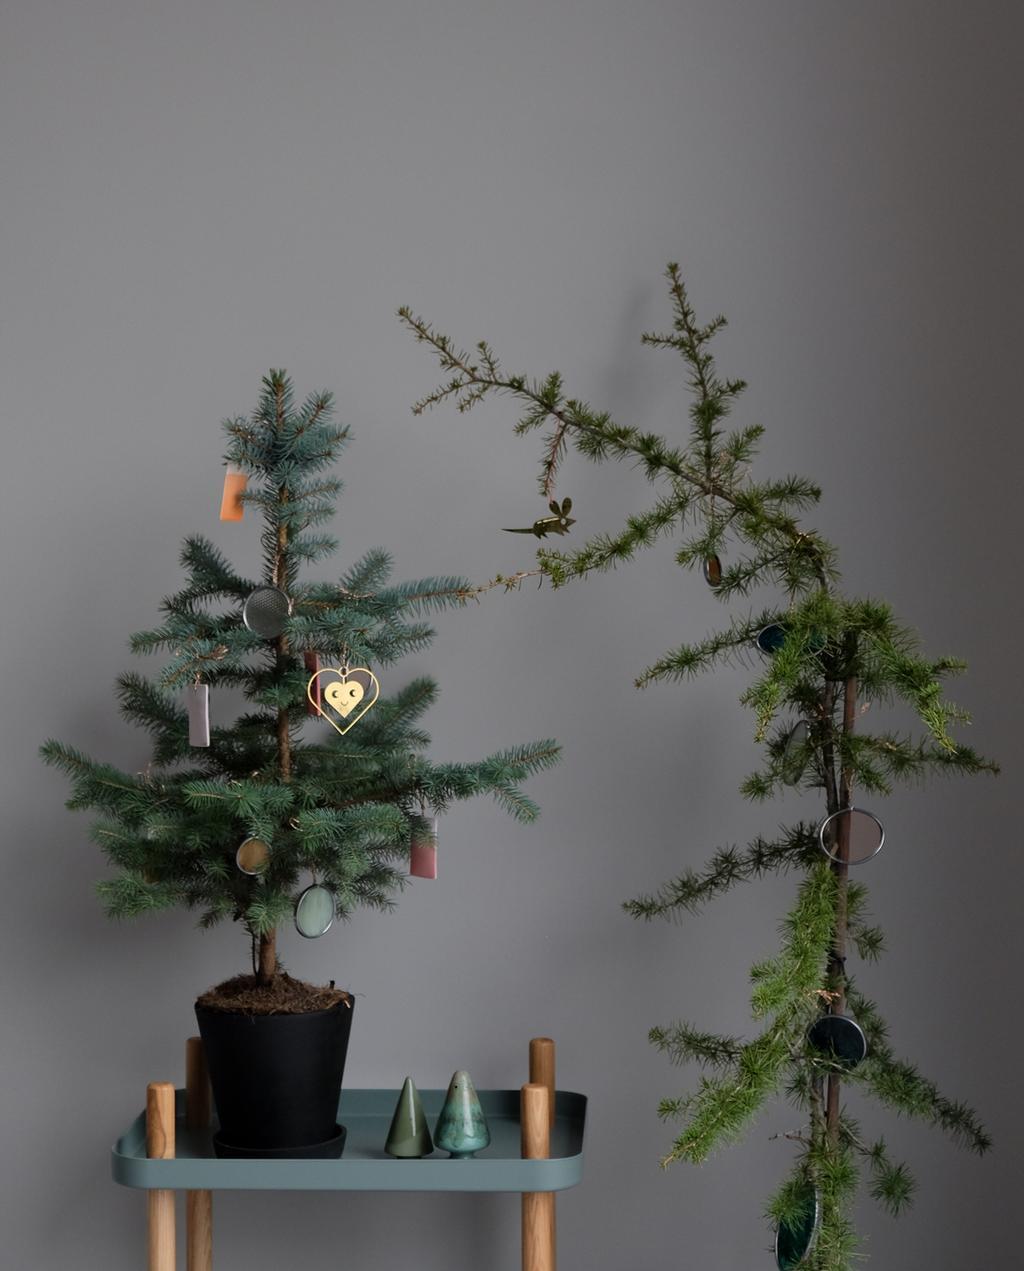 vtwonen | Blog PRCHTG kerstboom en tak